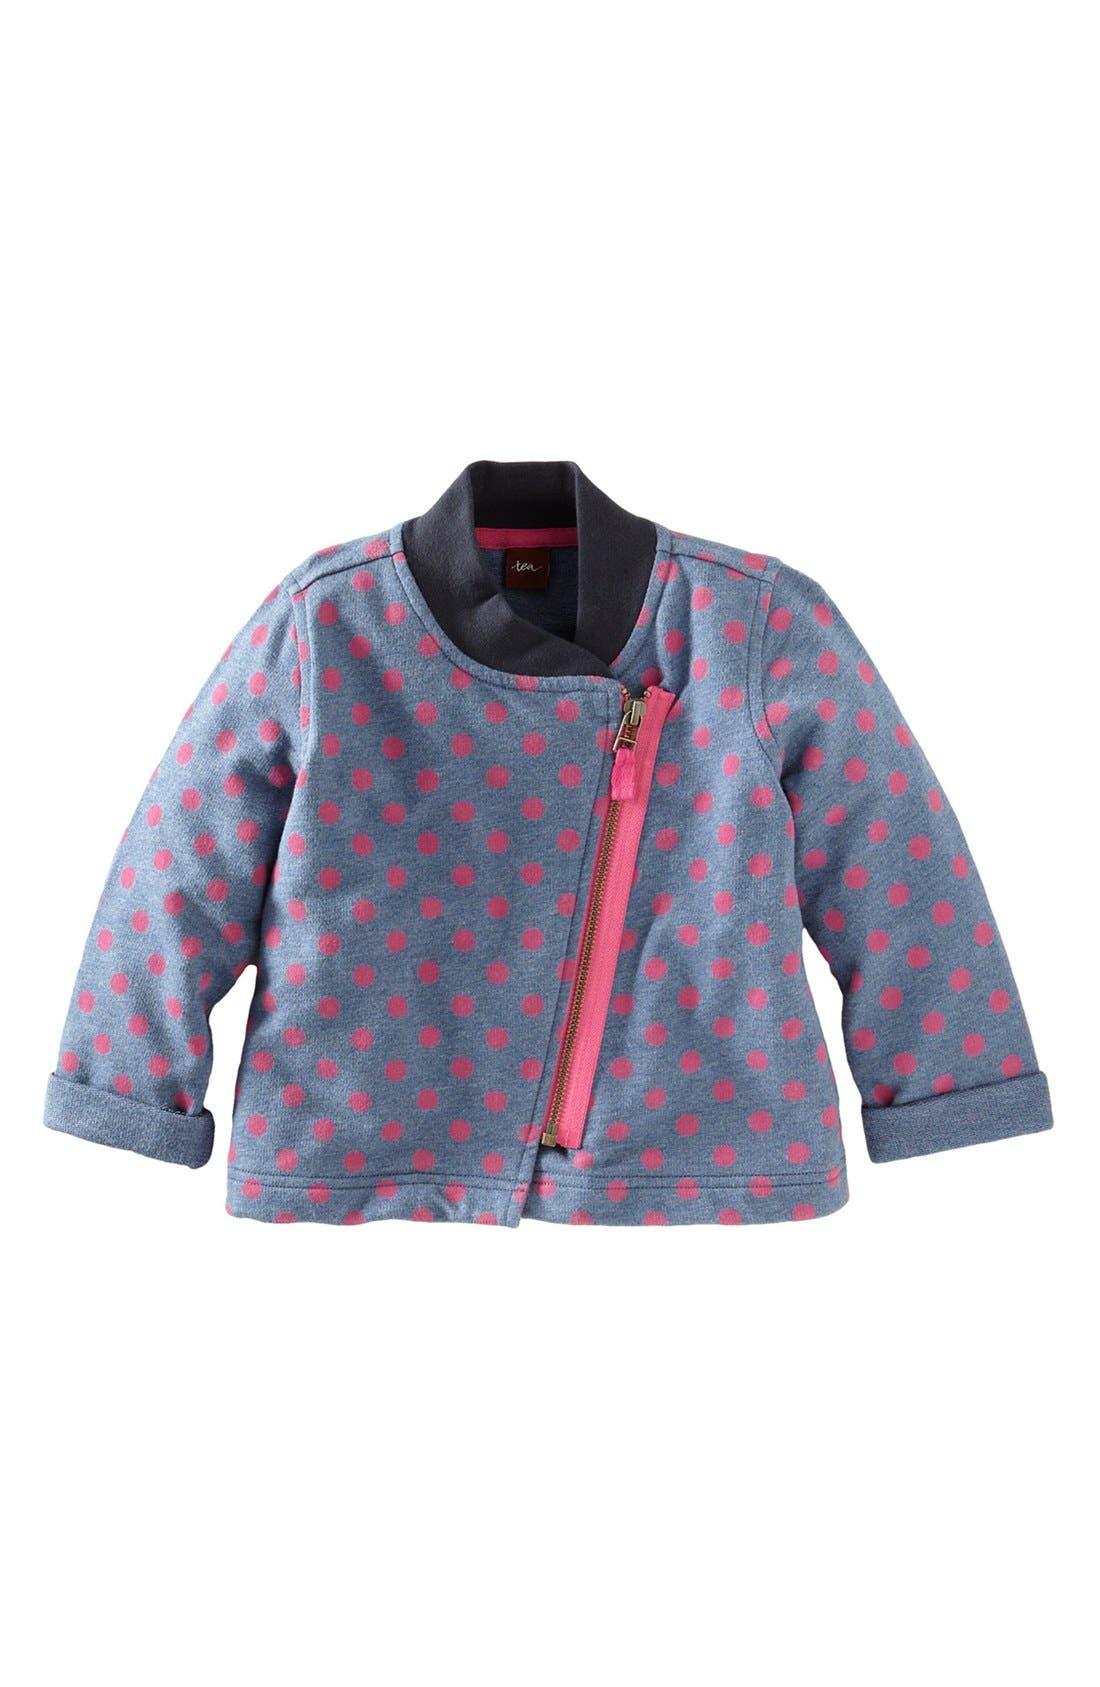 Alternate Image 1 Selected - Tea Collection Polka Dot Moto Jacket (Little Girls & Big Girls)